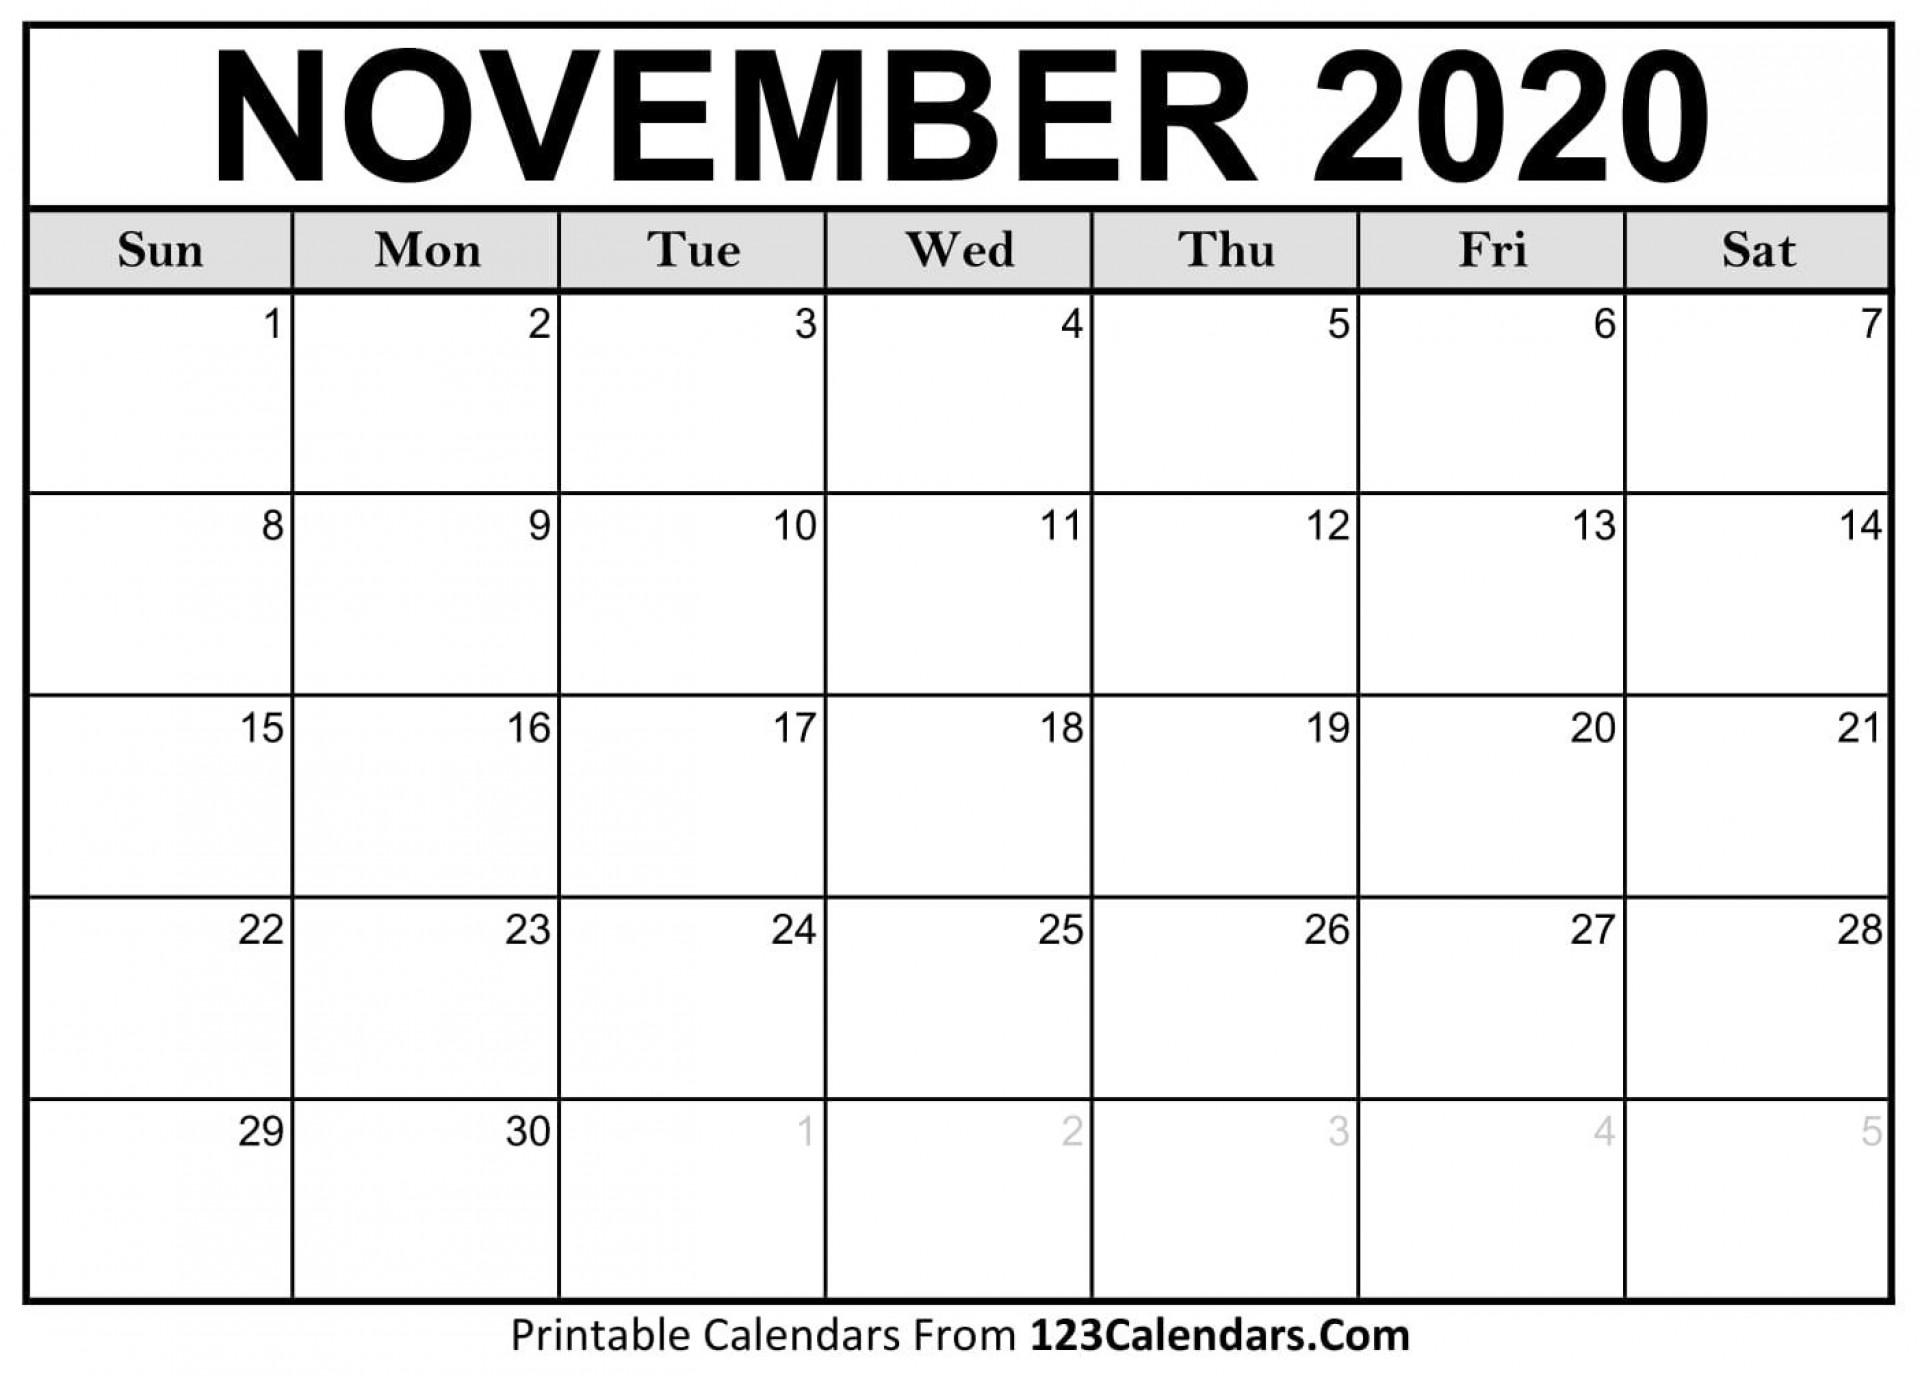 004 Unbelievable Printable Calendar Template November 2020 Idea  Free1920